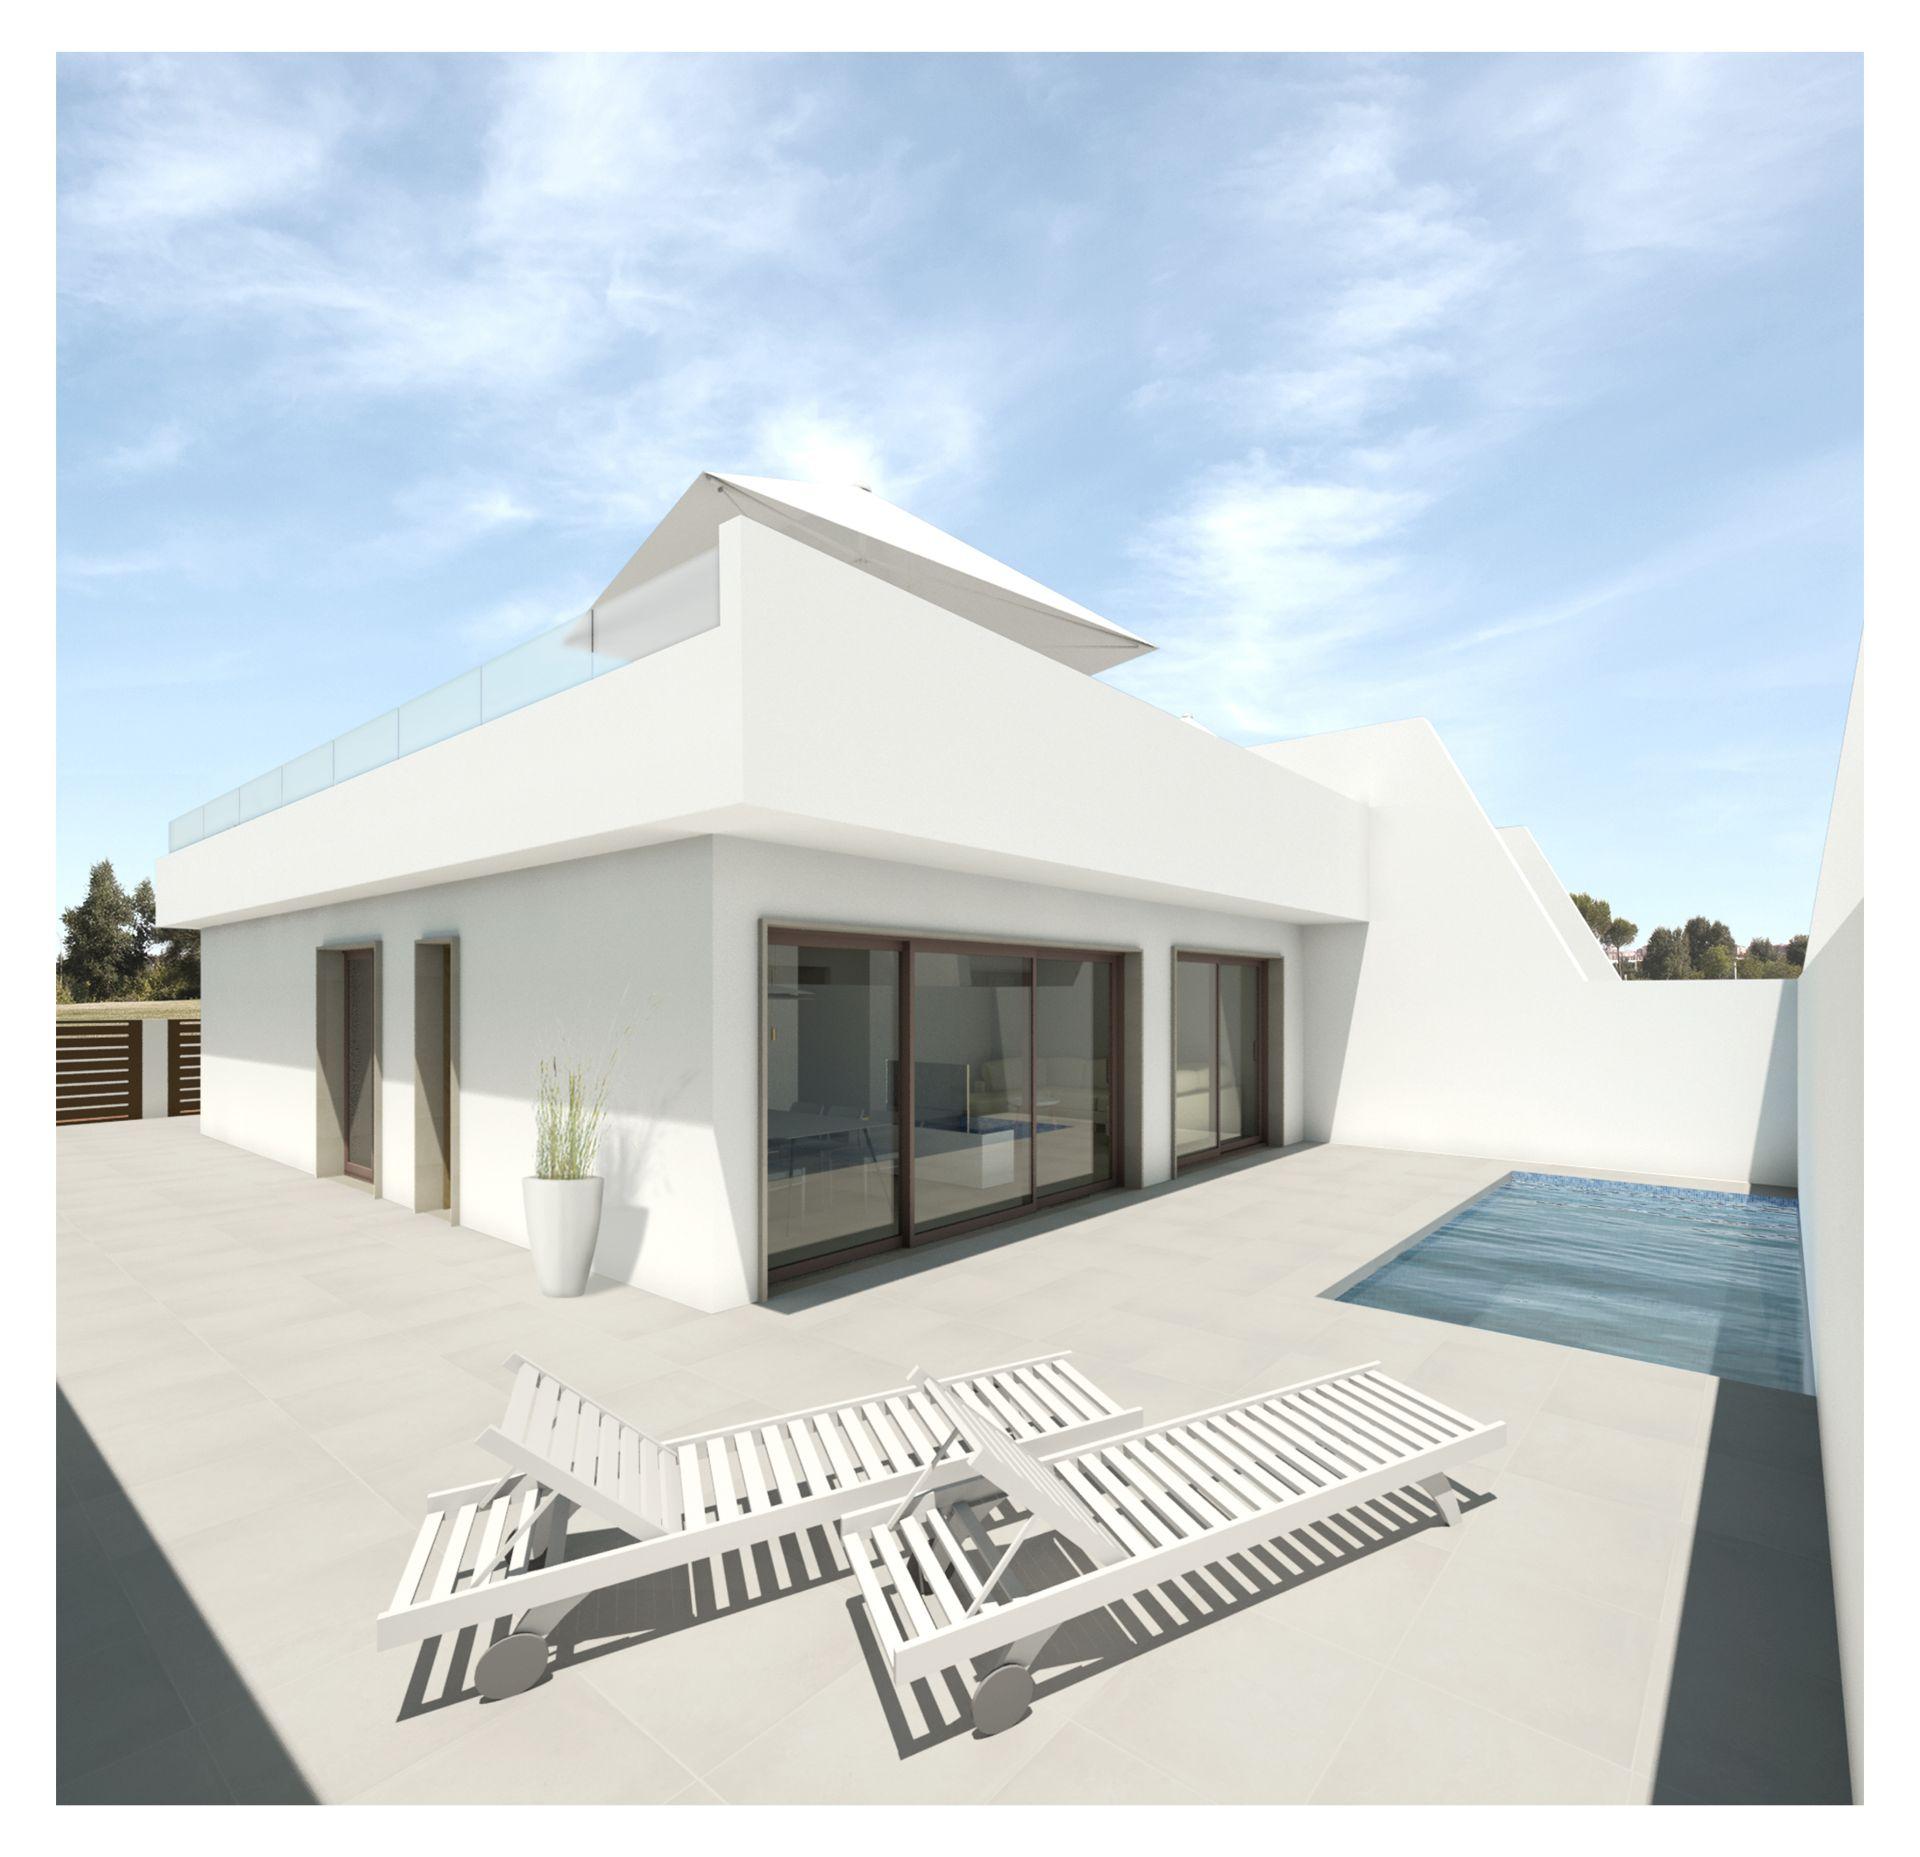 Propery For Sale in Pilar de la Horadada, Spain image 2